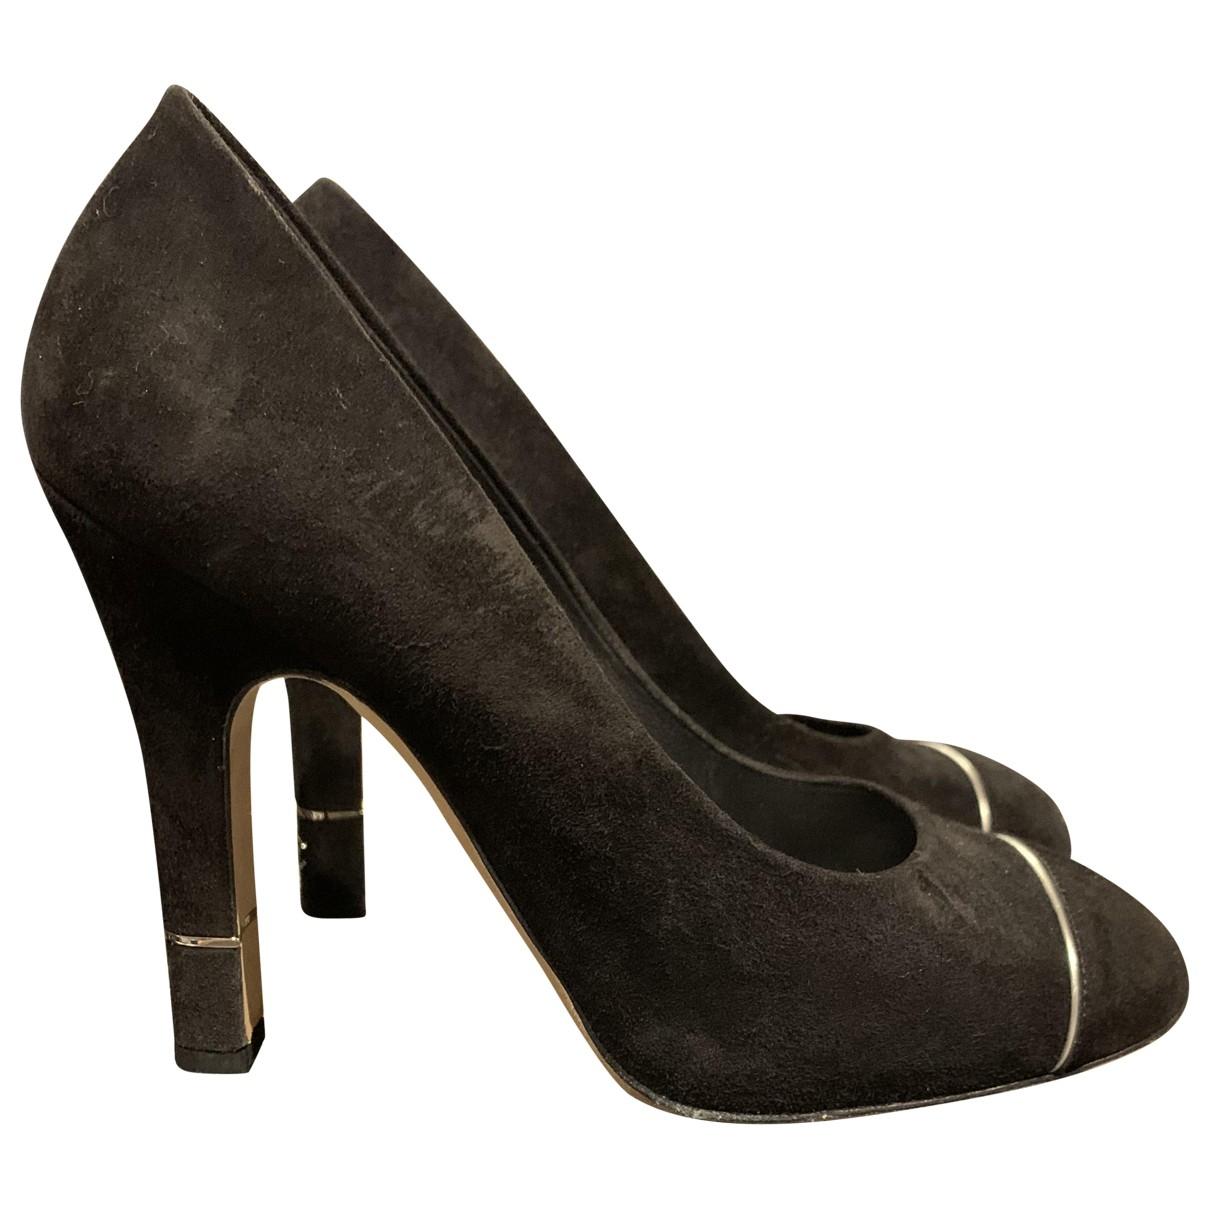 Chanel \N Black Suede Heels for Women 38.5 EU